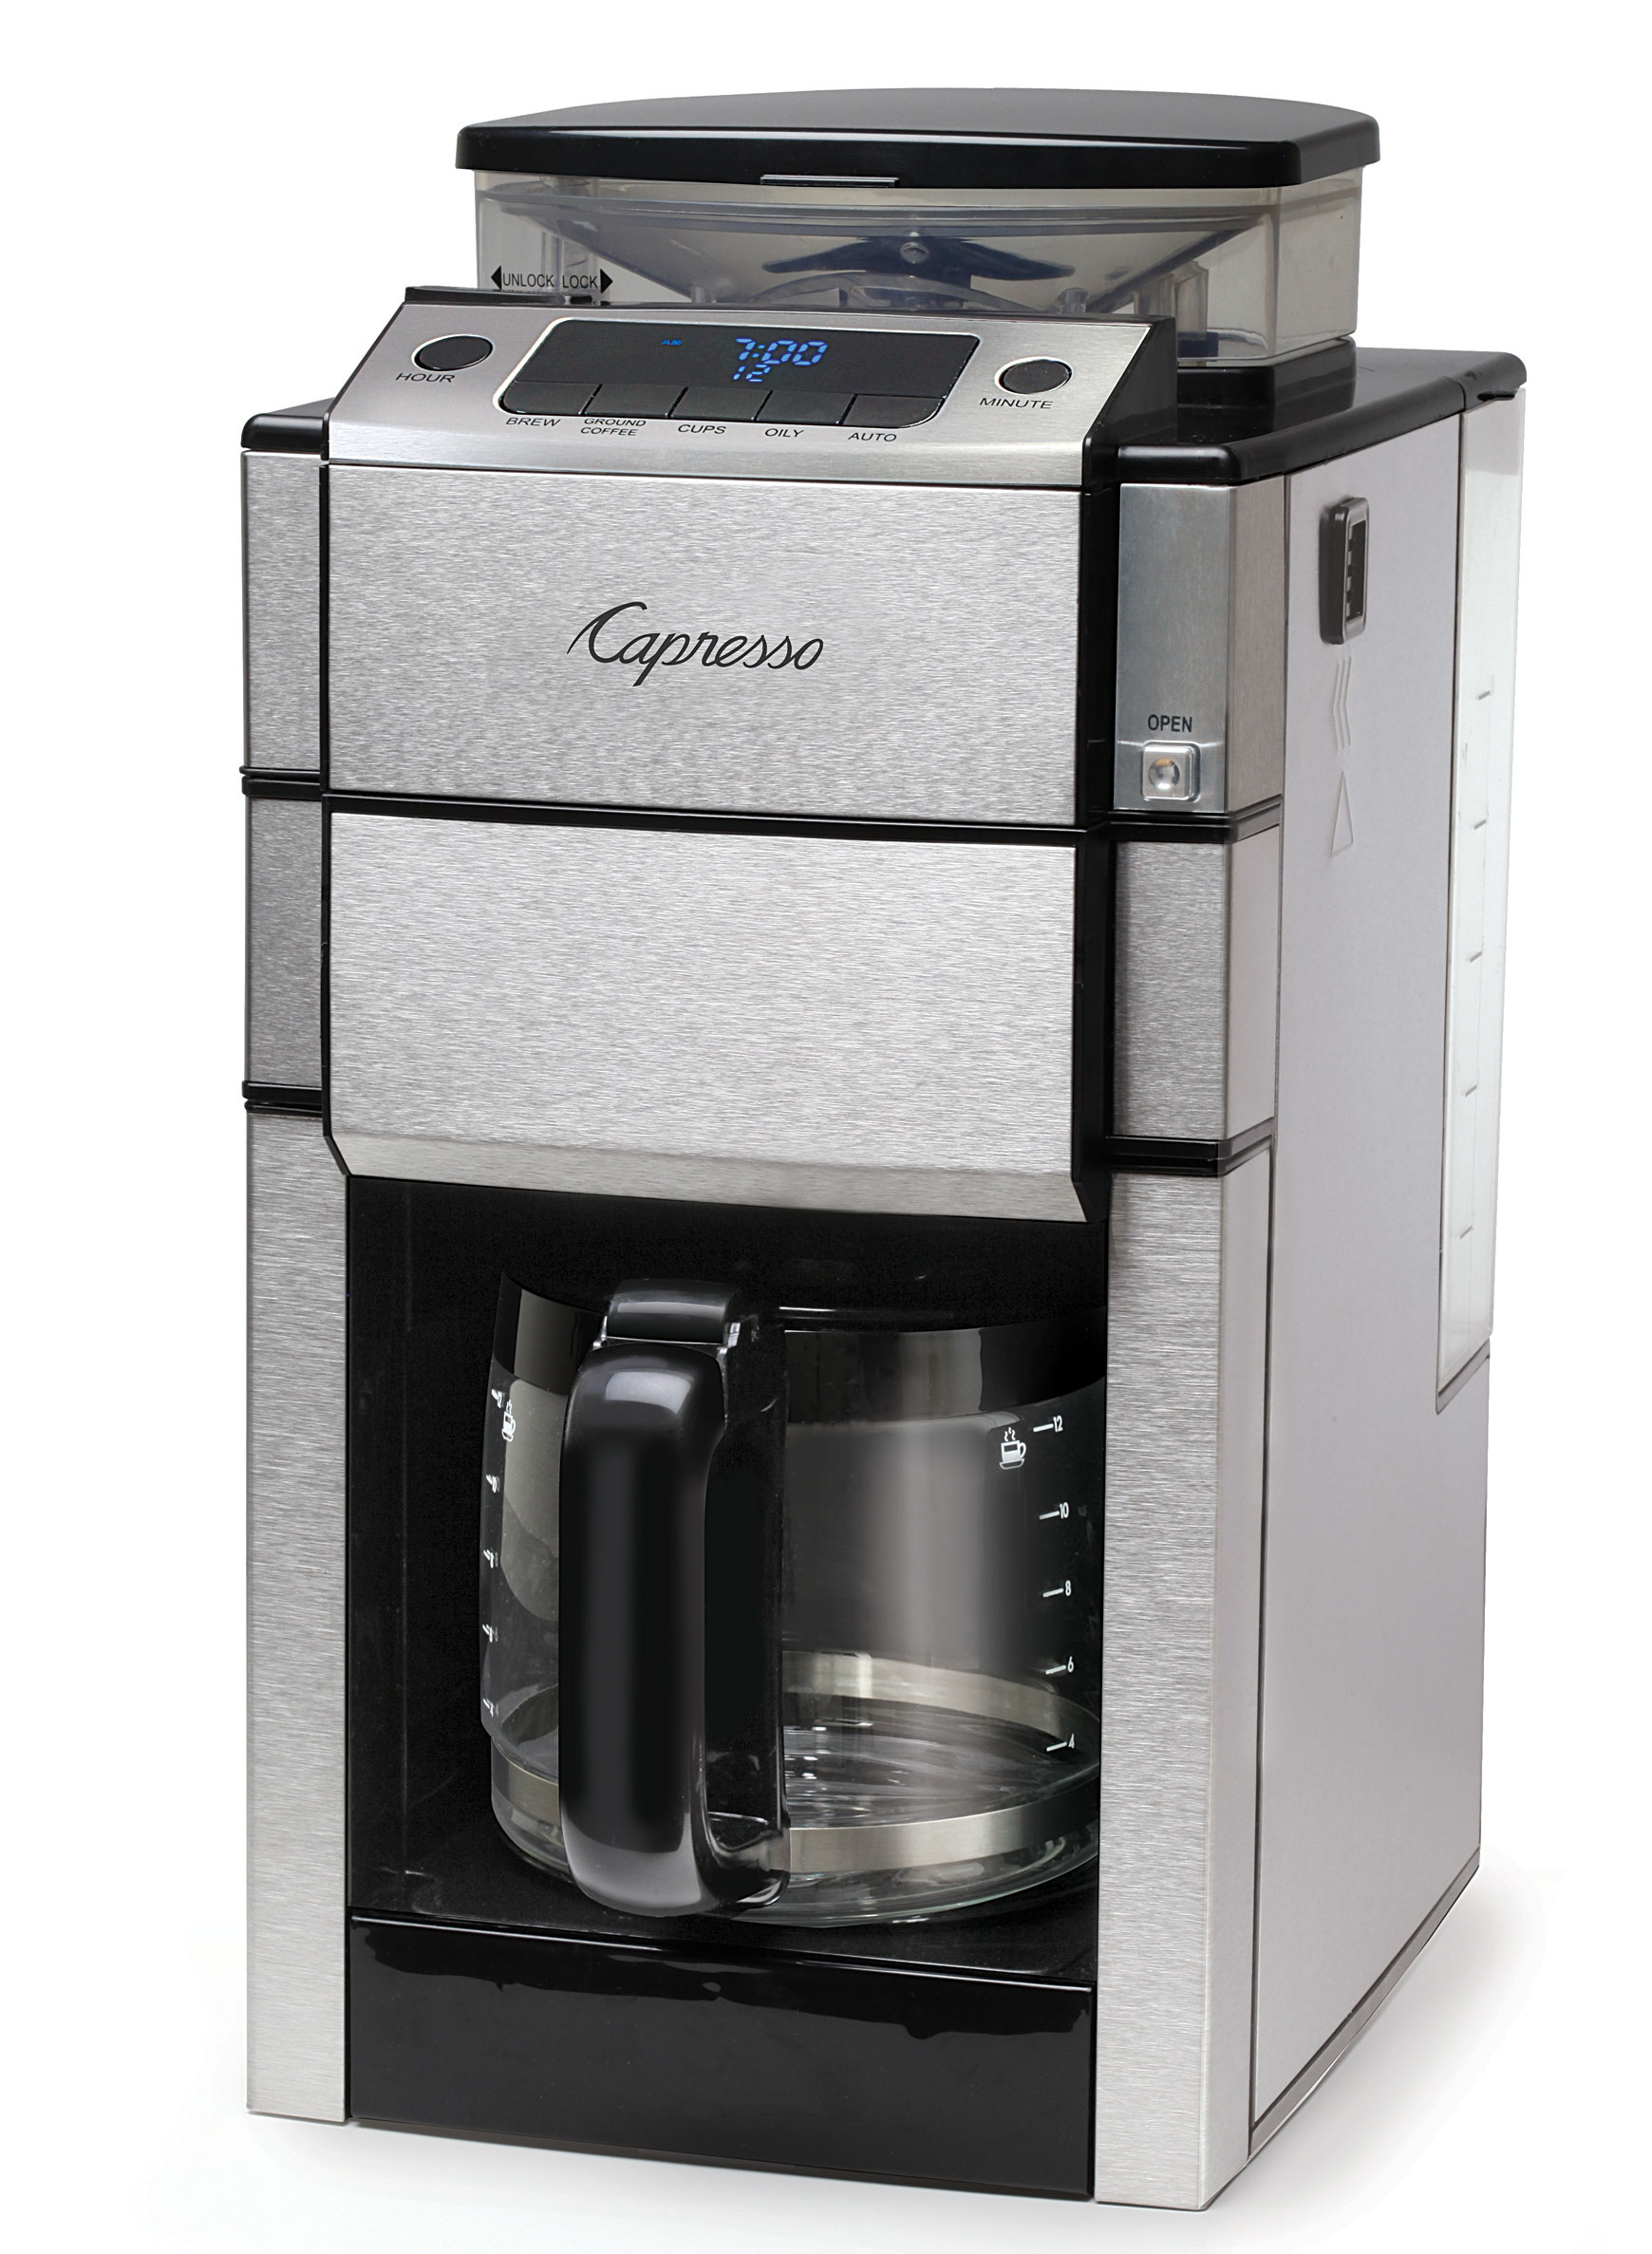 Capresso Coffee Team Pro Plus Capresso Coffee Maker With